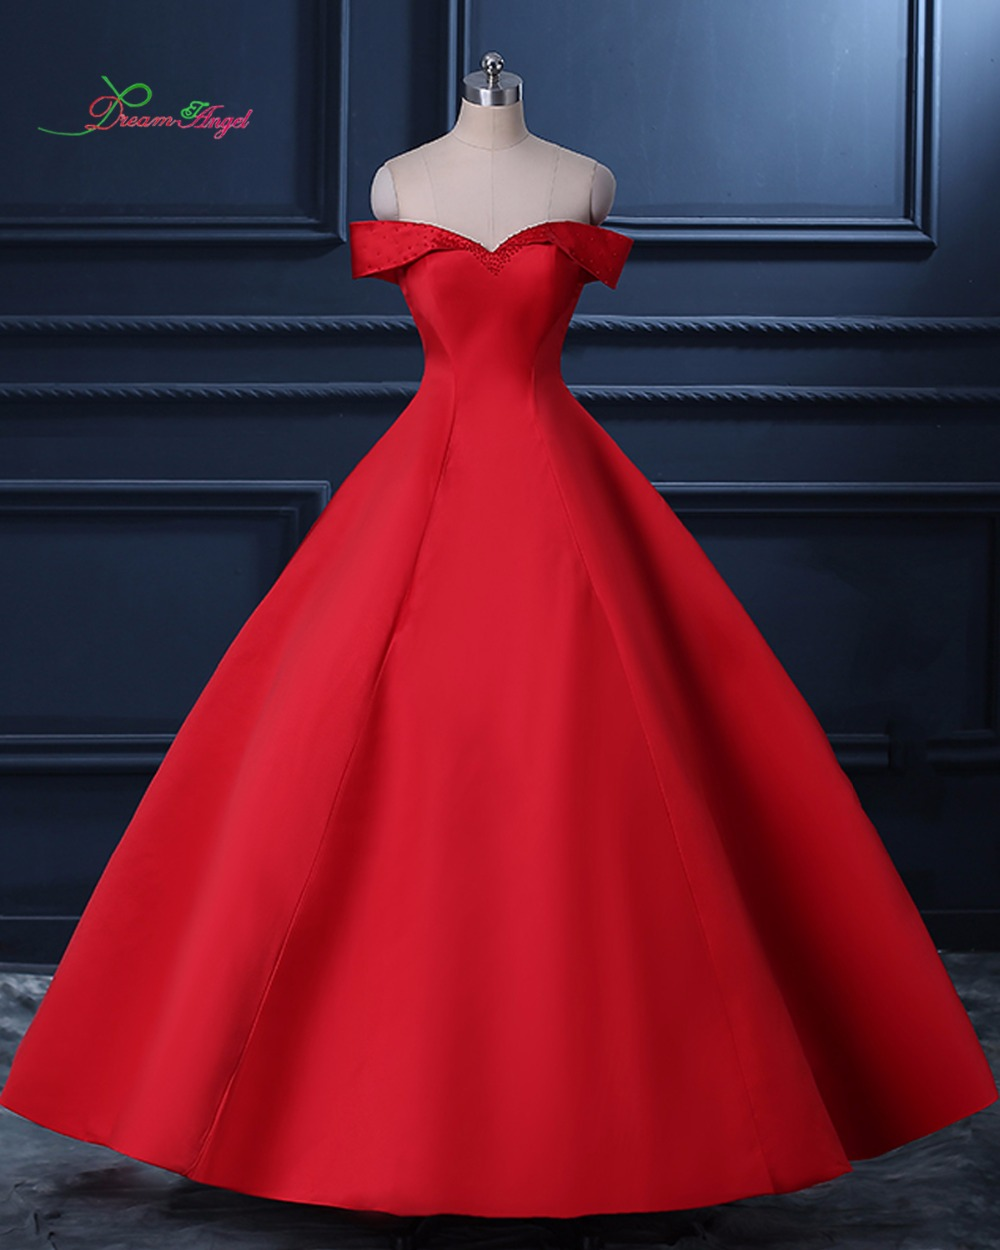 Dream Angel Simple Boat Neck Taffeta Ball Gown Prom Dresses 2018 Sleeveless  Floor Length Pearls